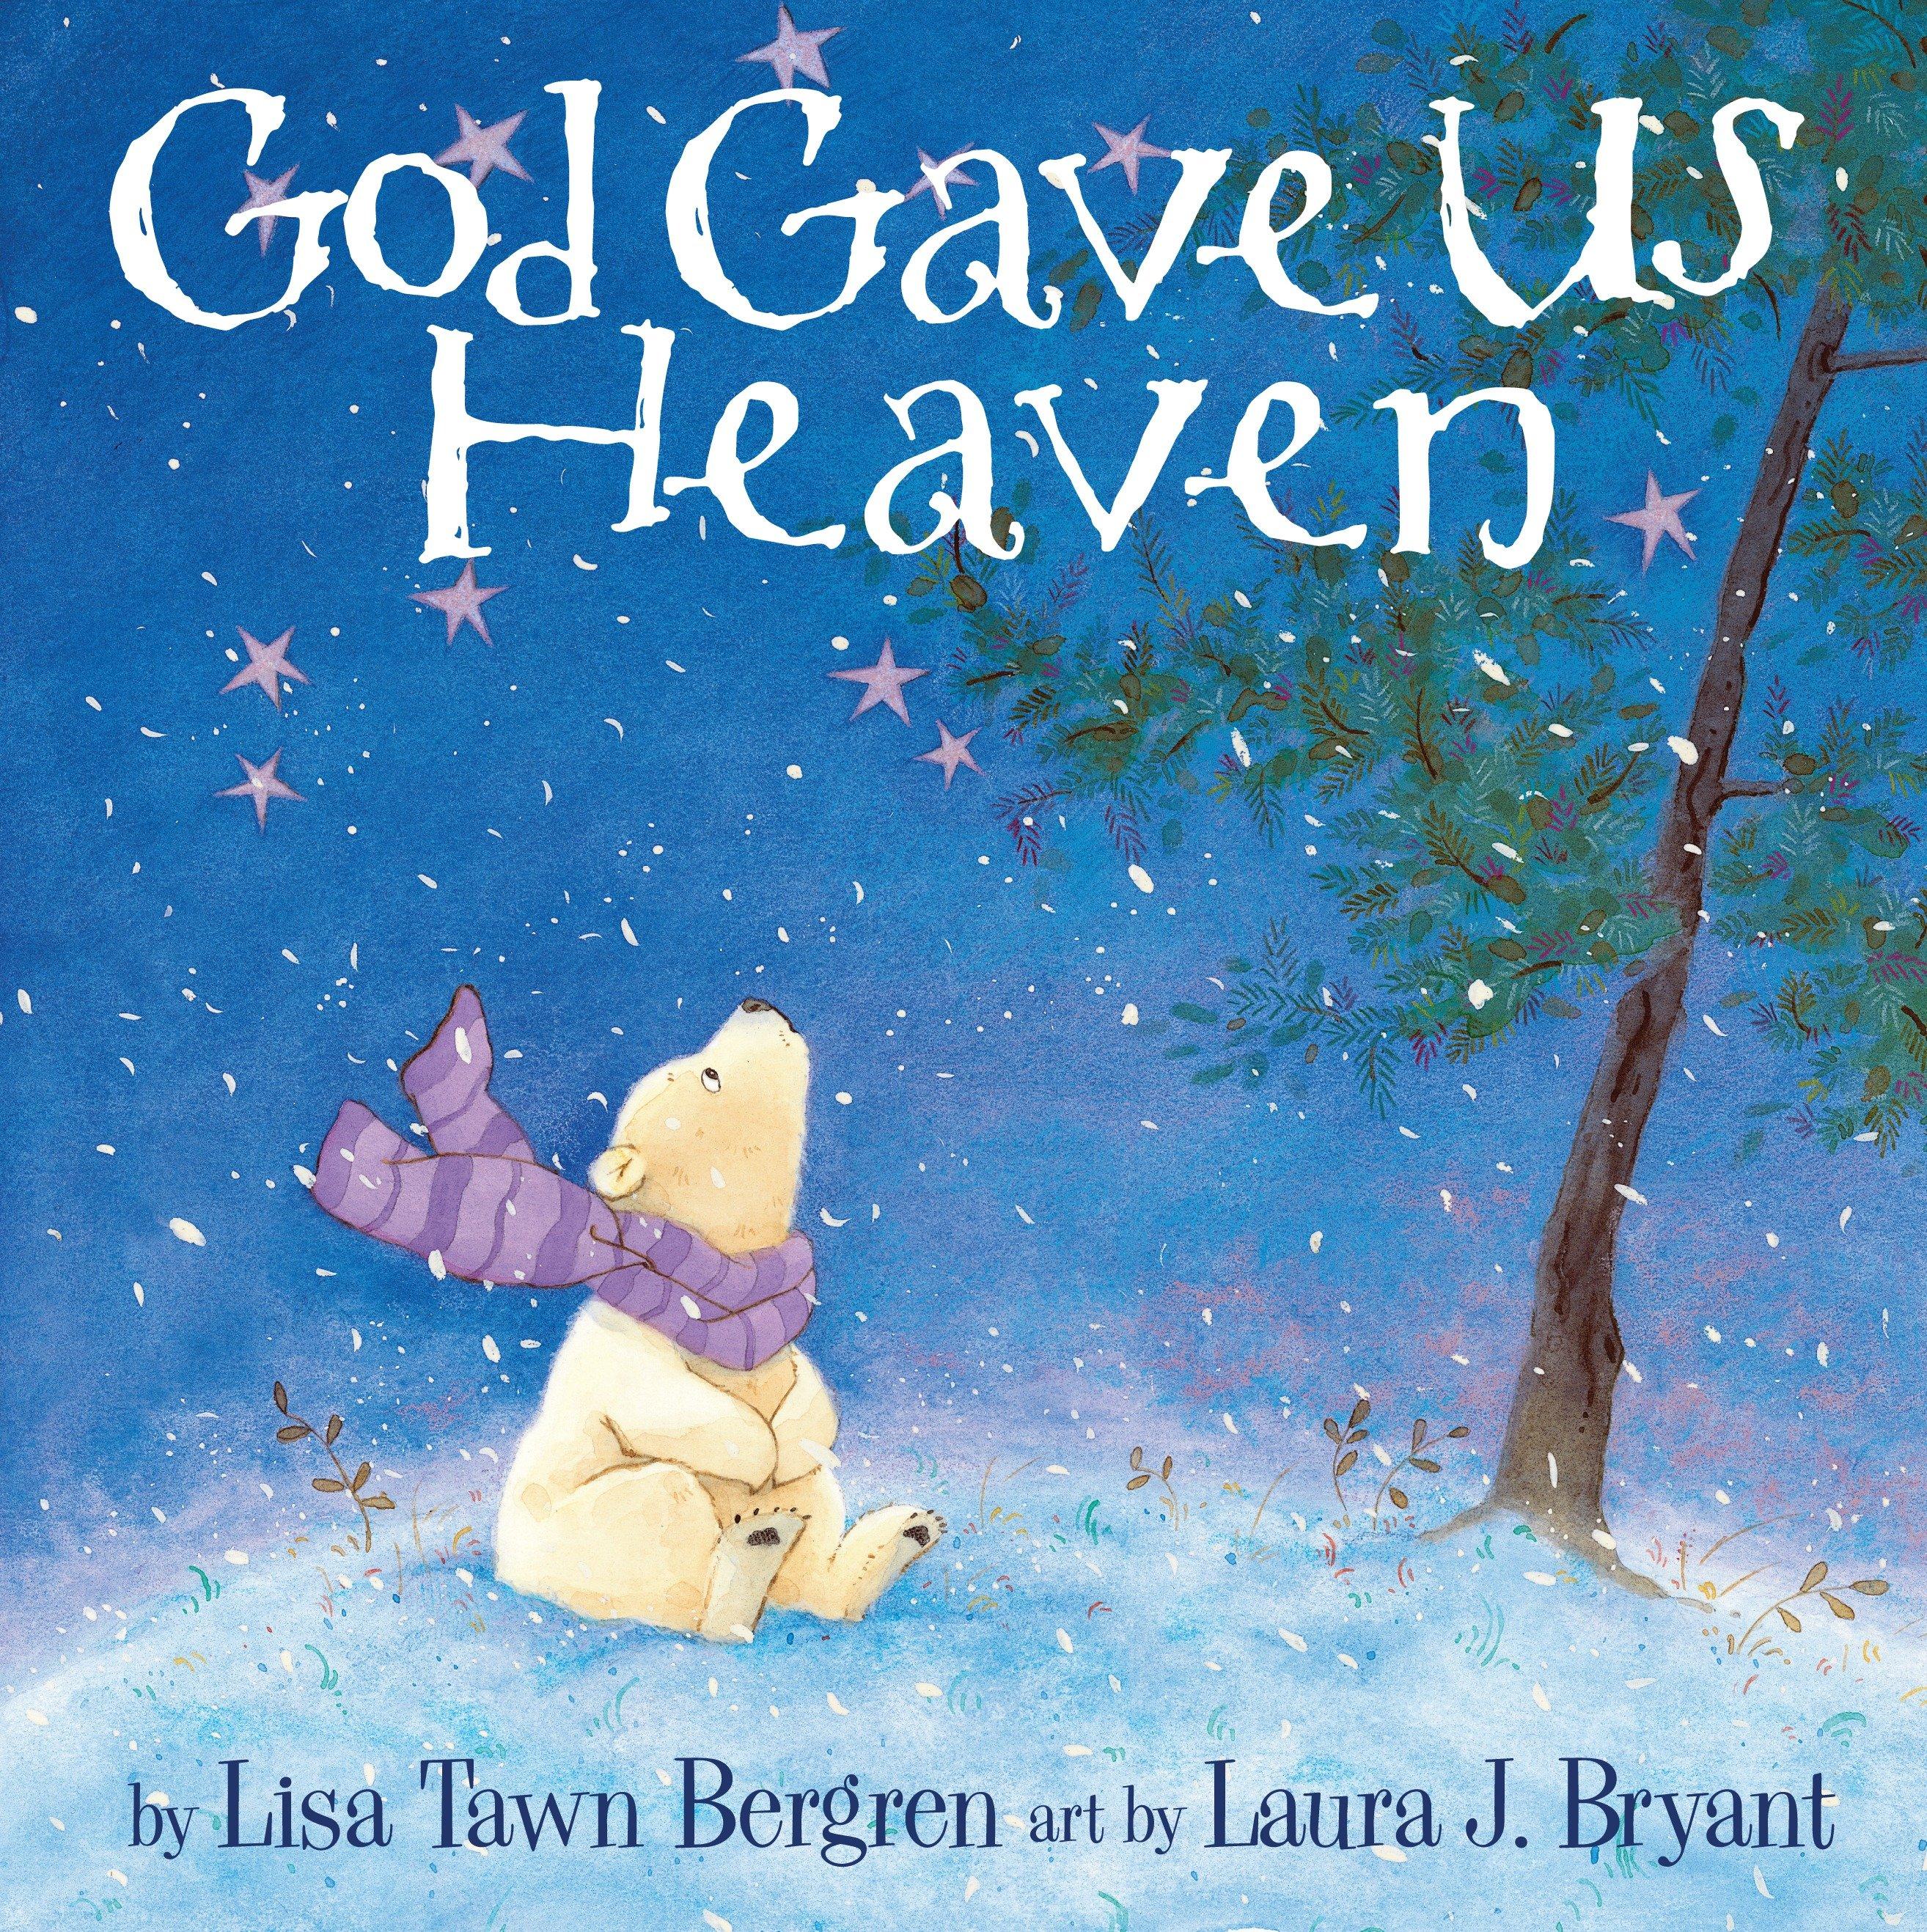 God gave us heaven cover image